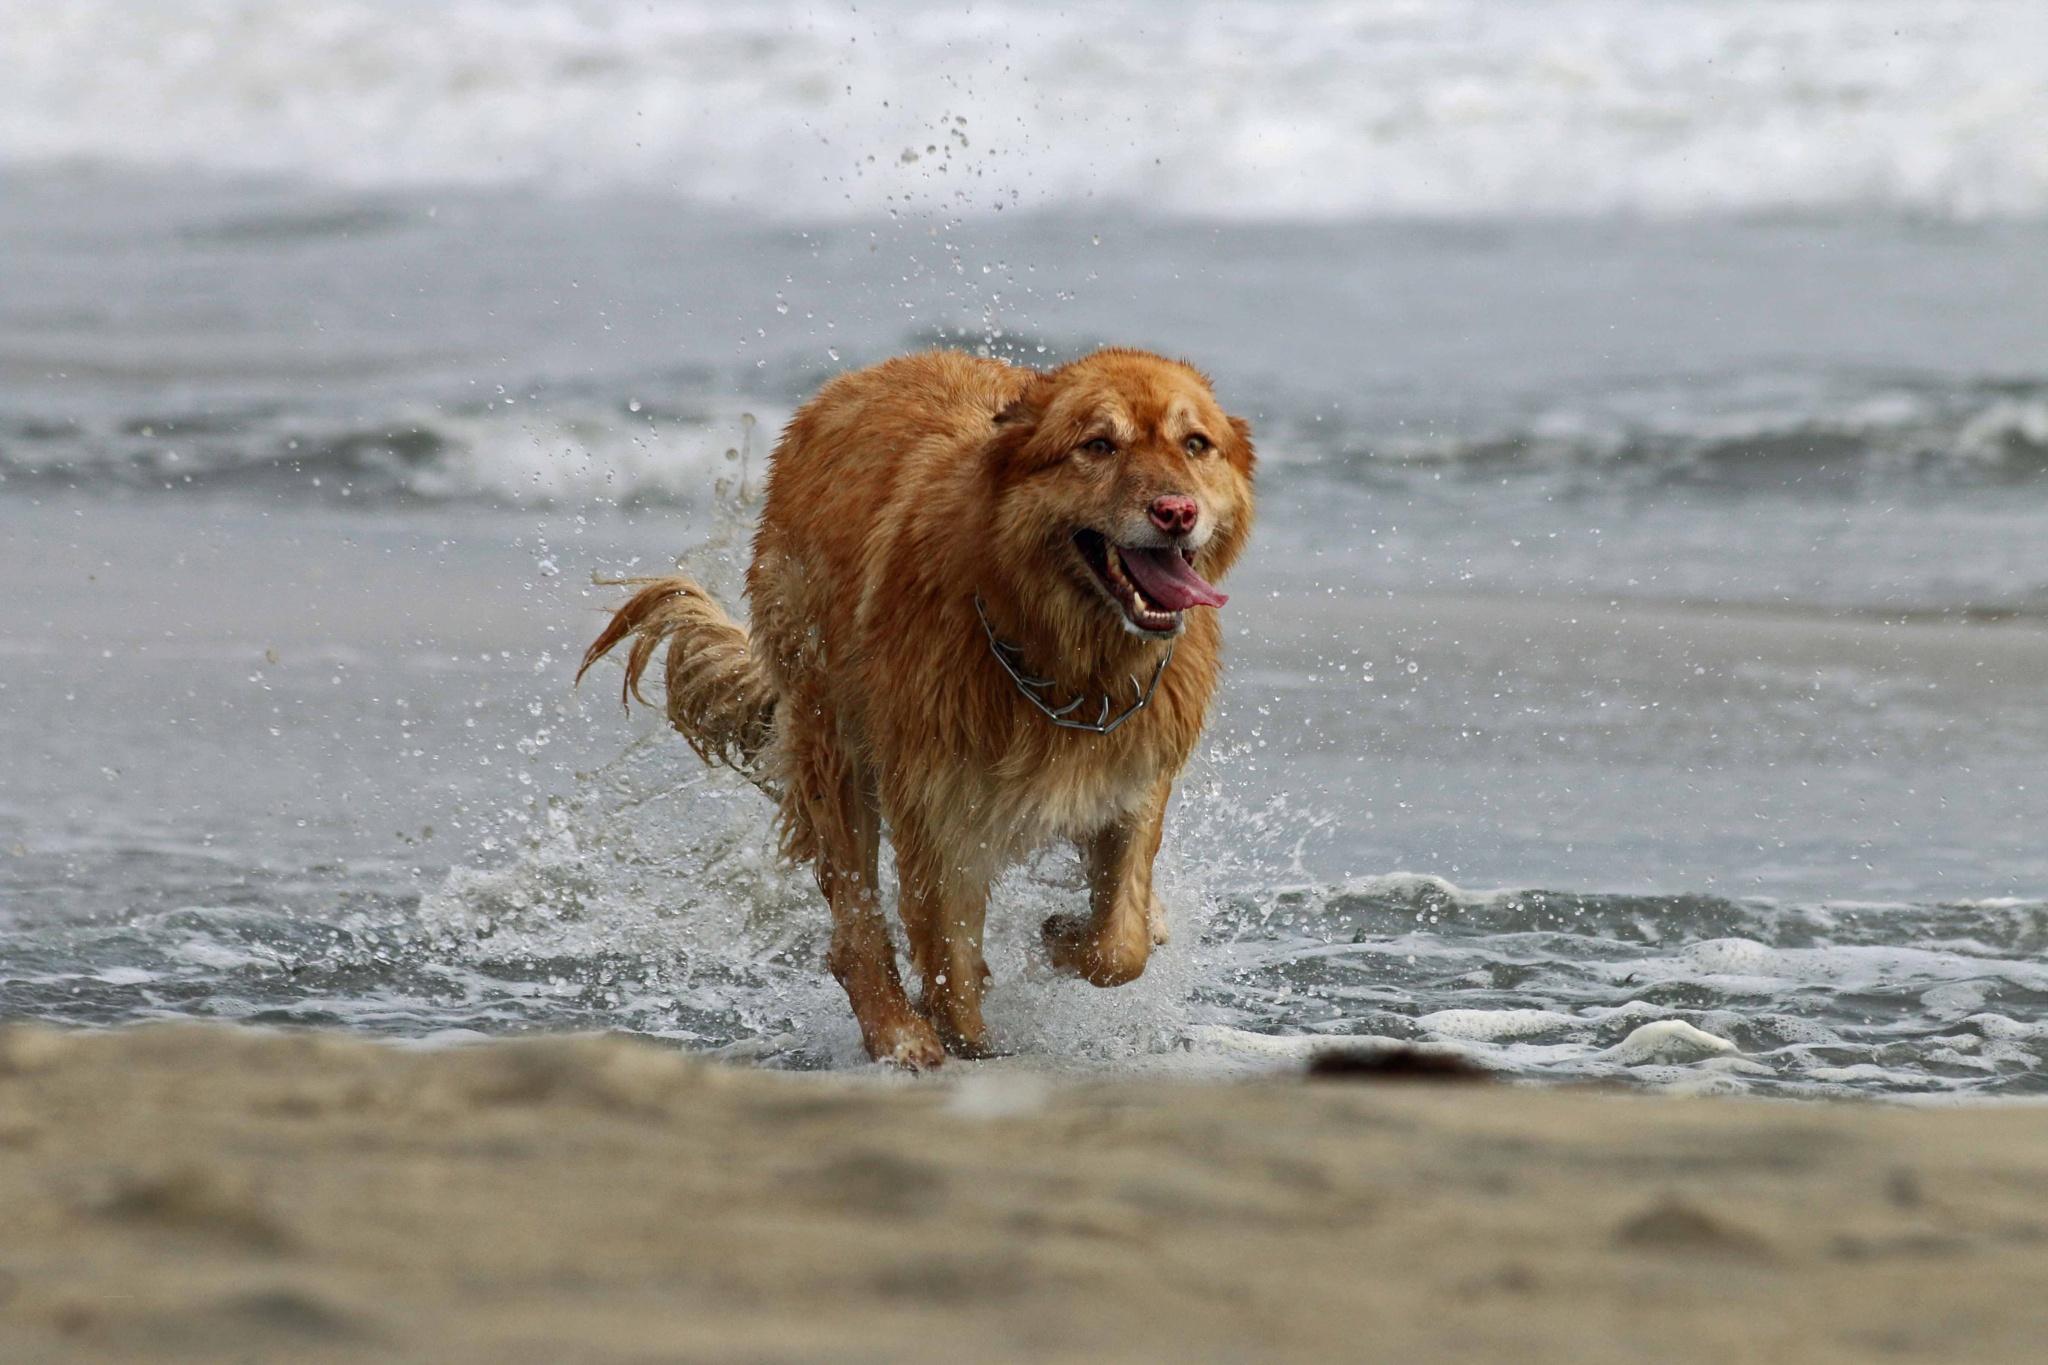 Sea dog by John_Ediger